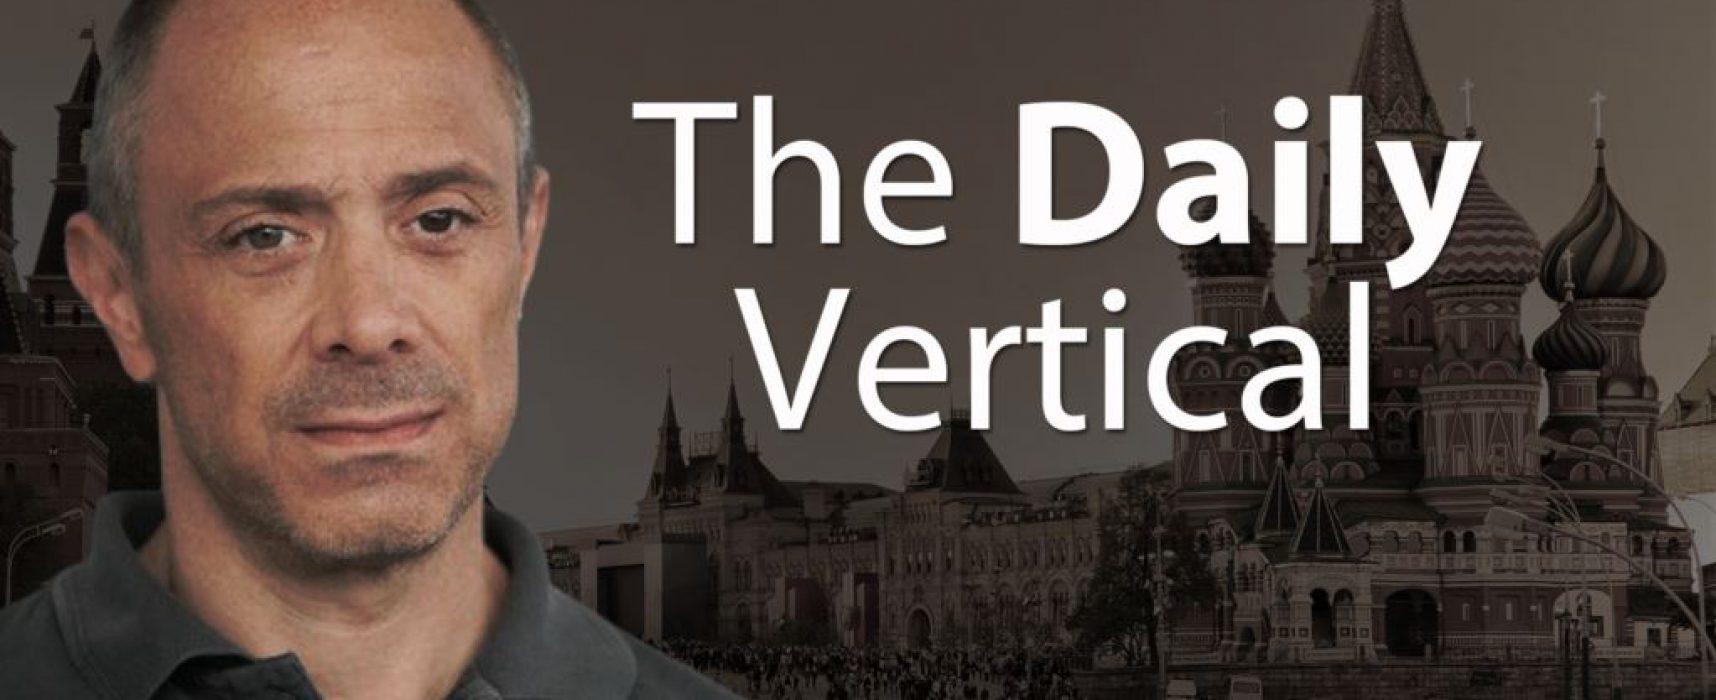 The Daily Vertical: Making Corruption Top-Secret (Transcript)